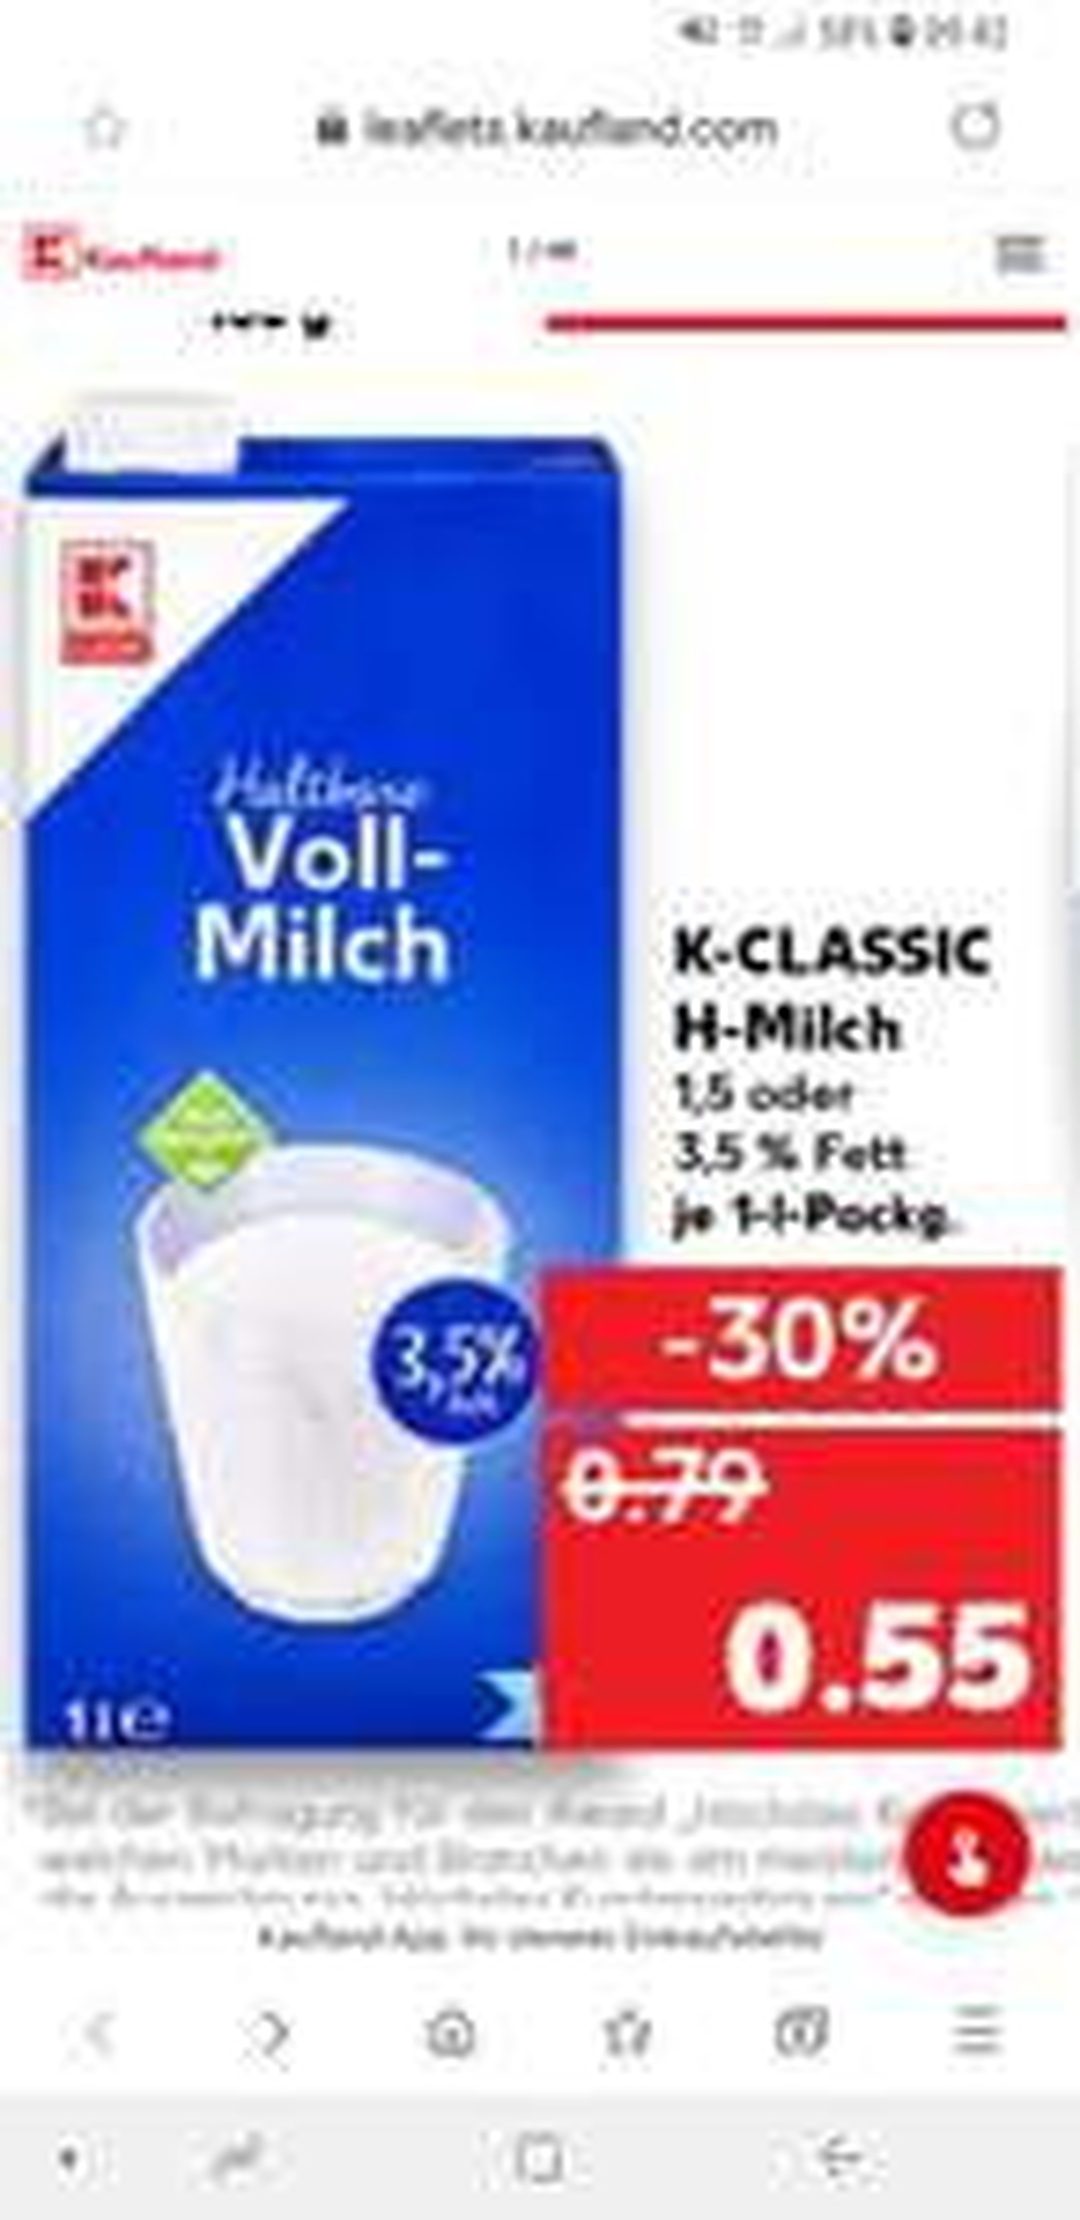 K-CLASSIC: H-Milch 1,5 oder 3,5 % Fett